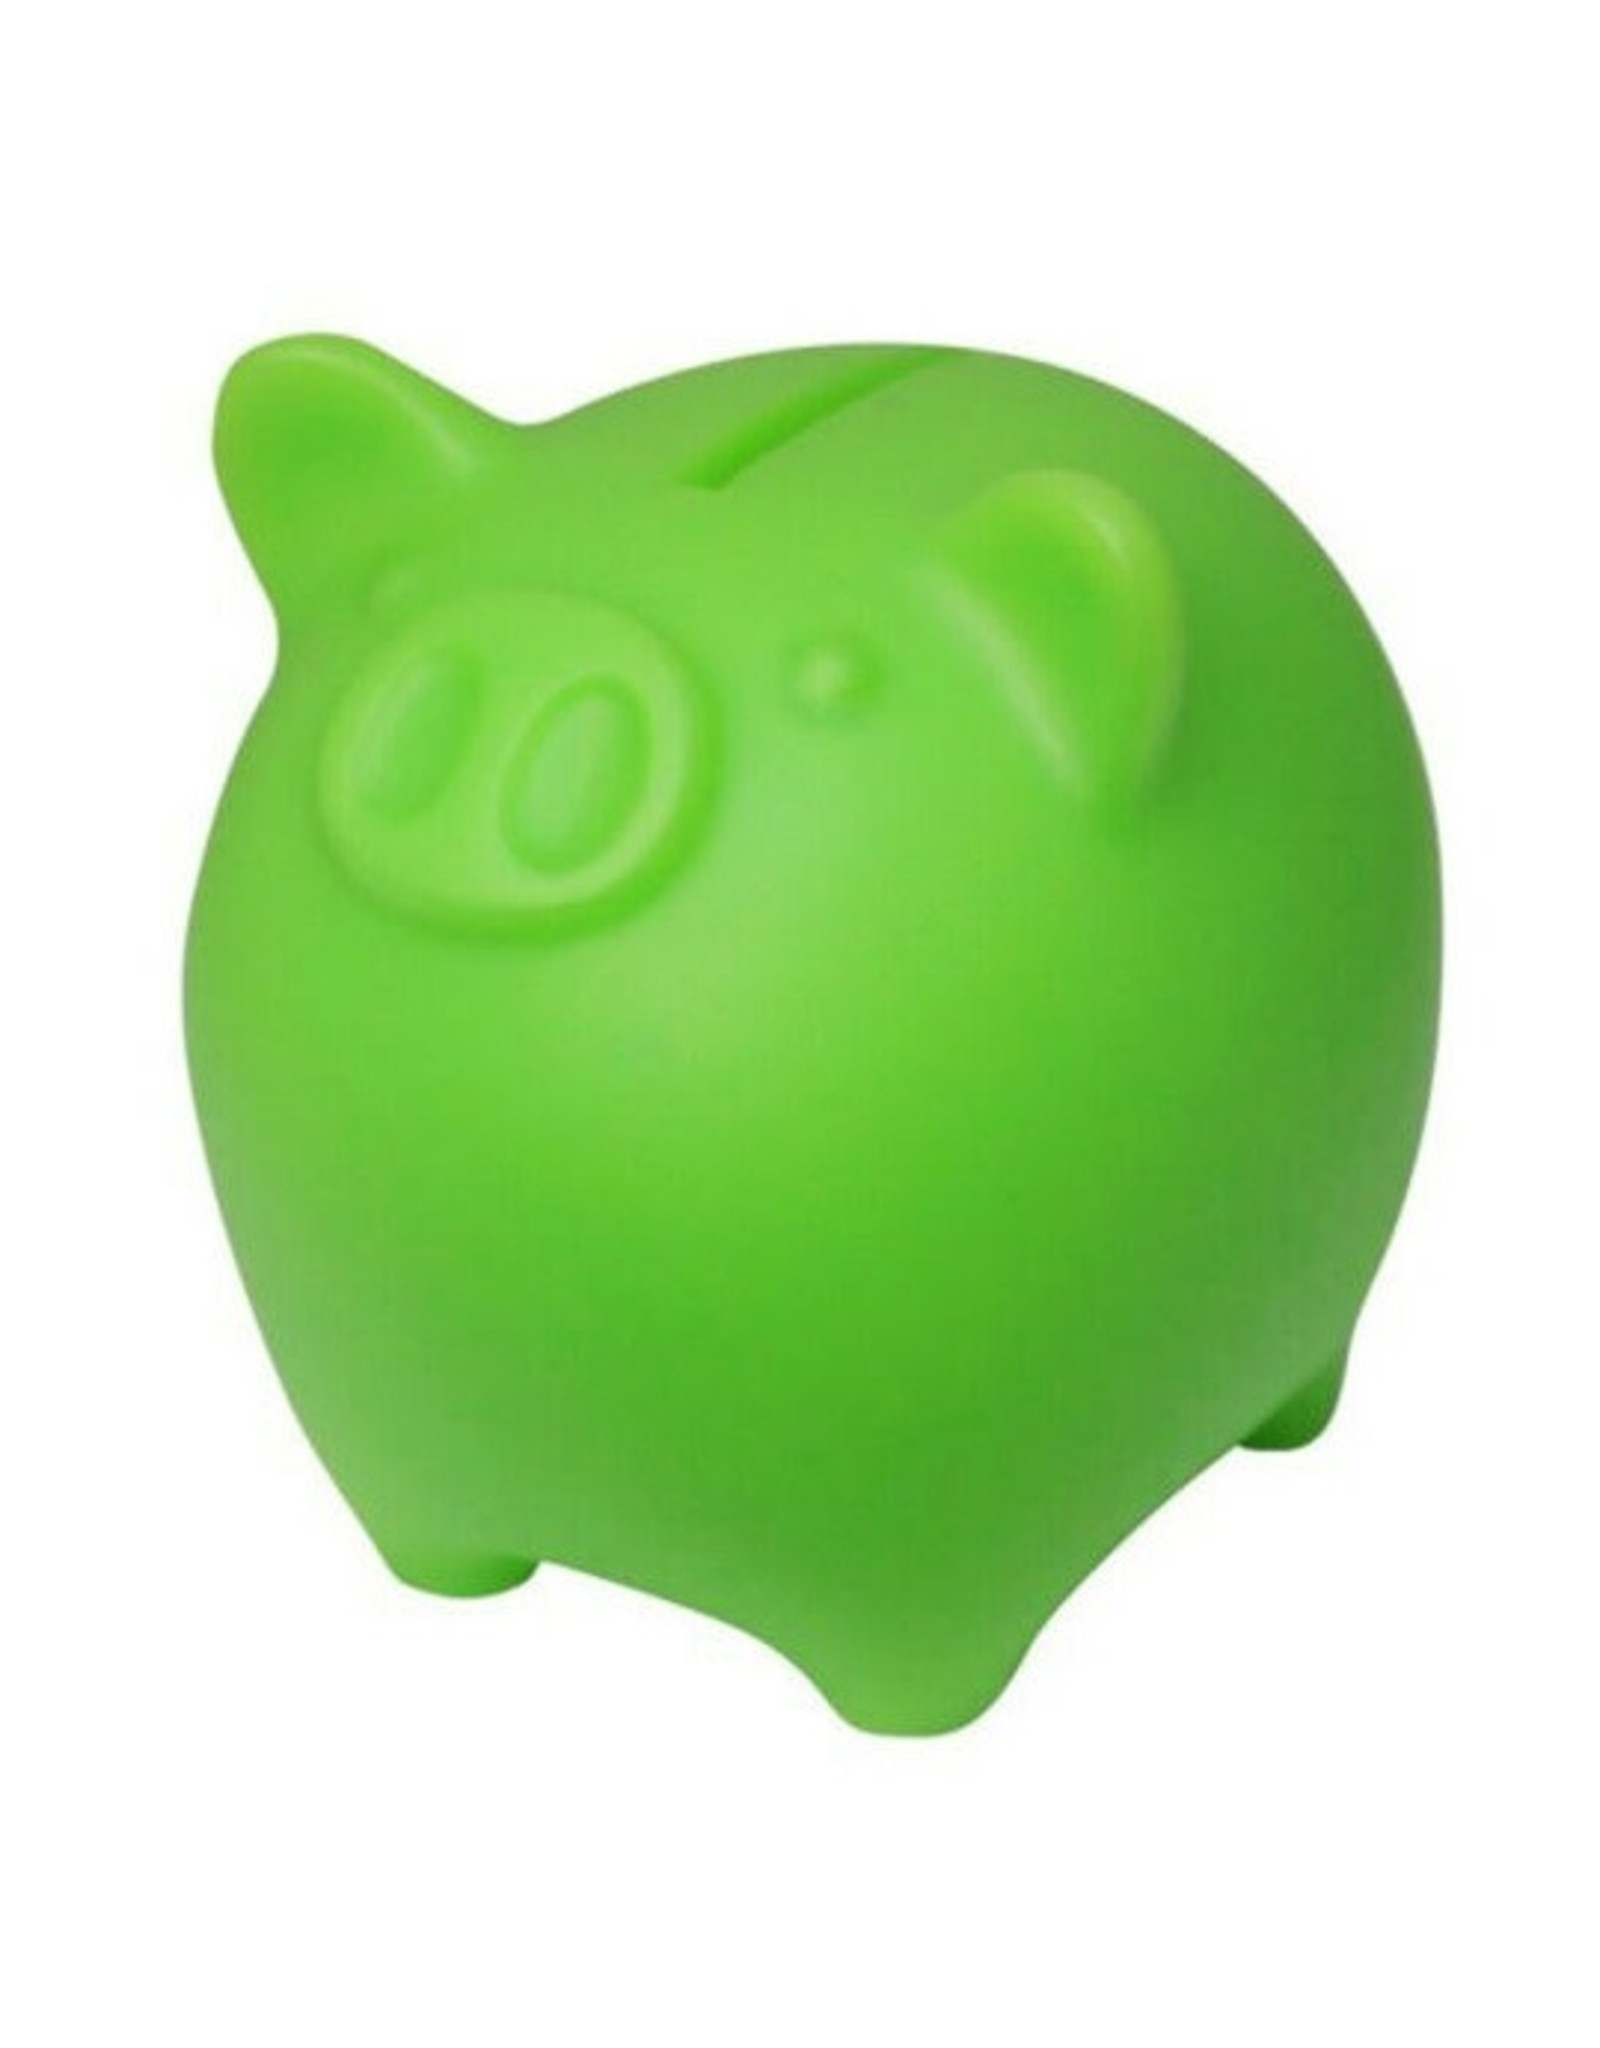 Coink! Rich Green